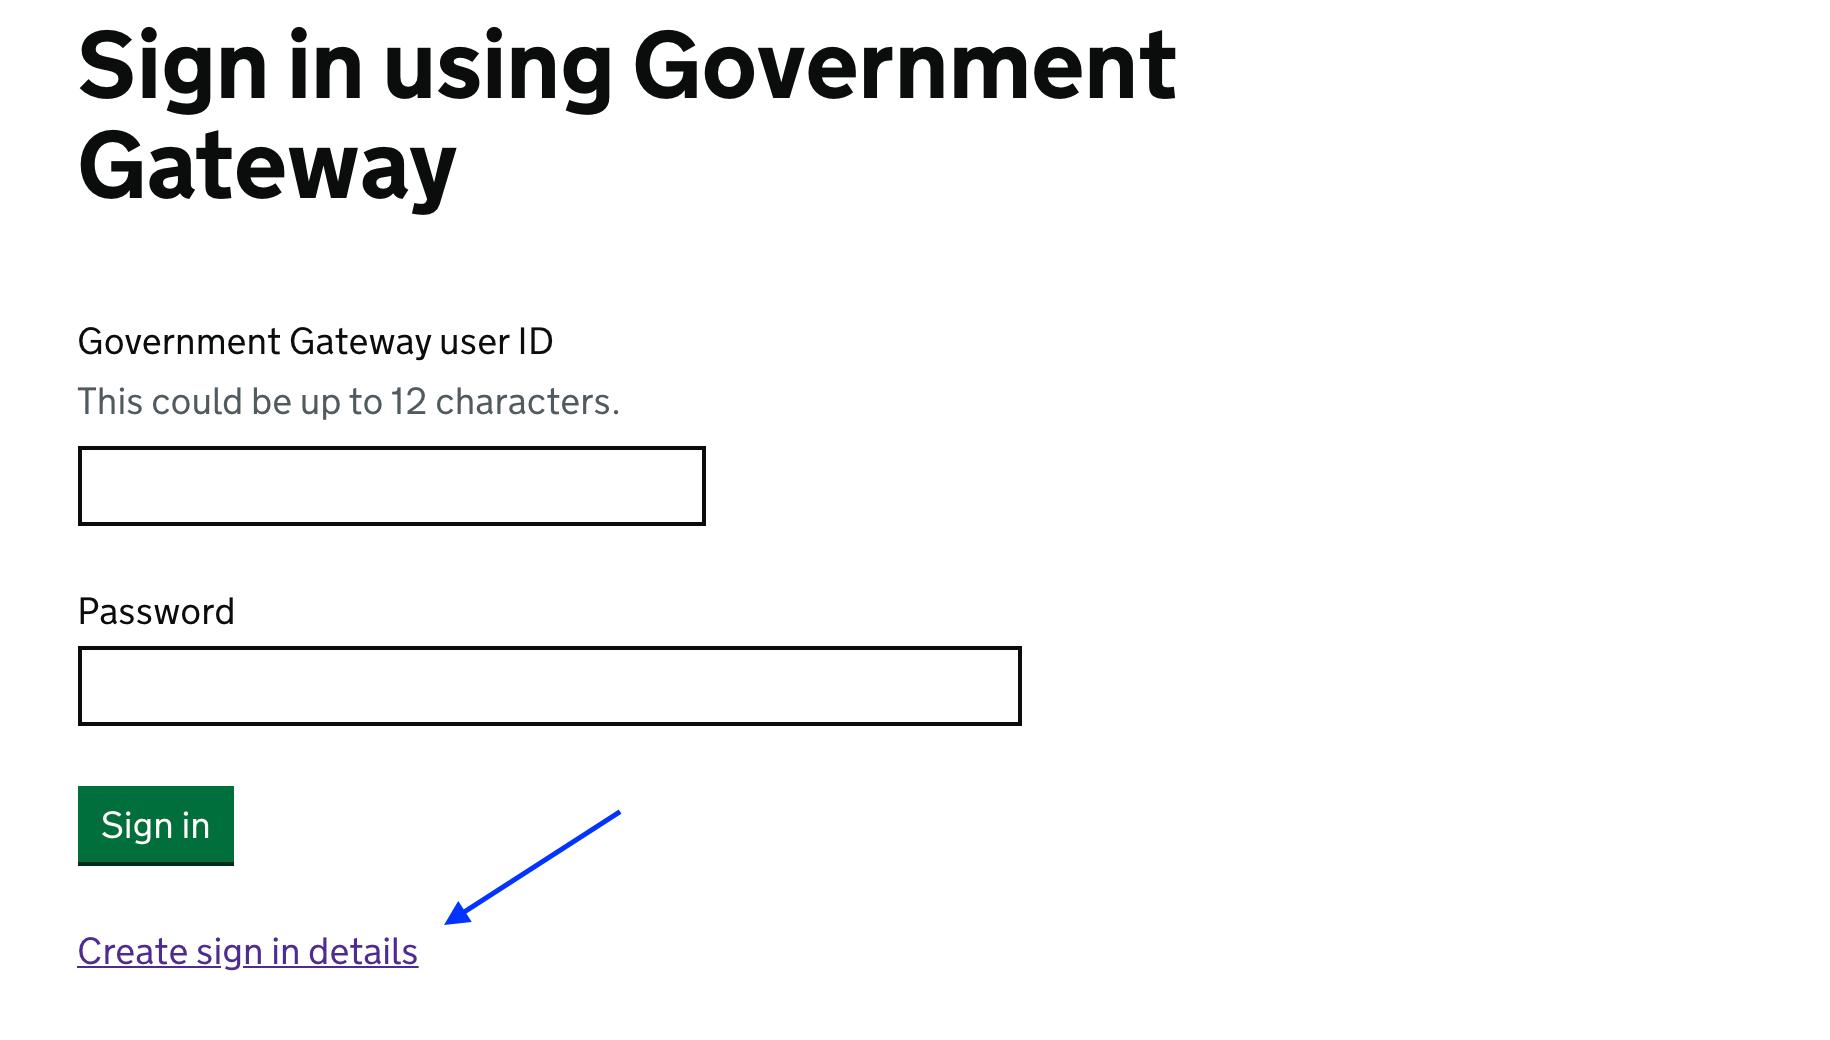 Create Account on HMRC's Website